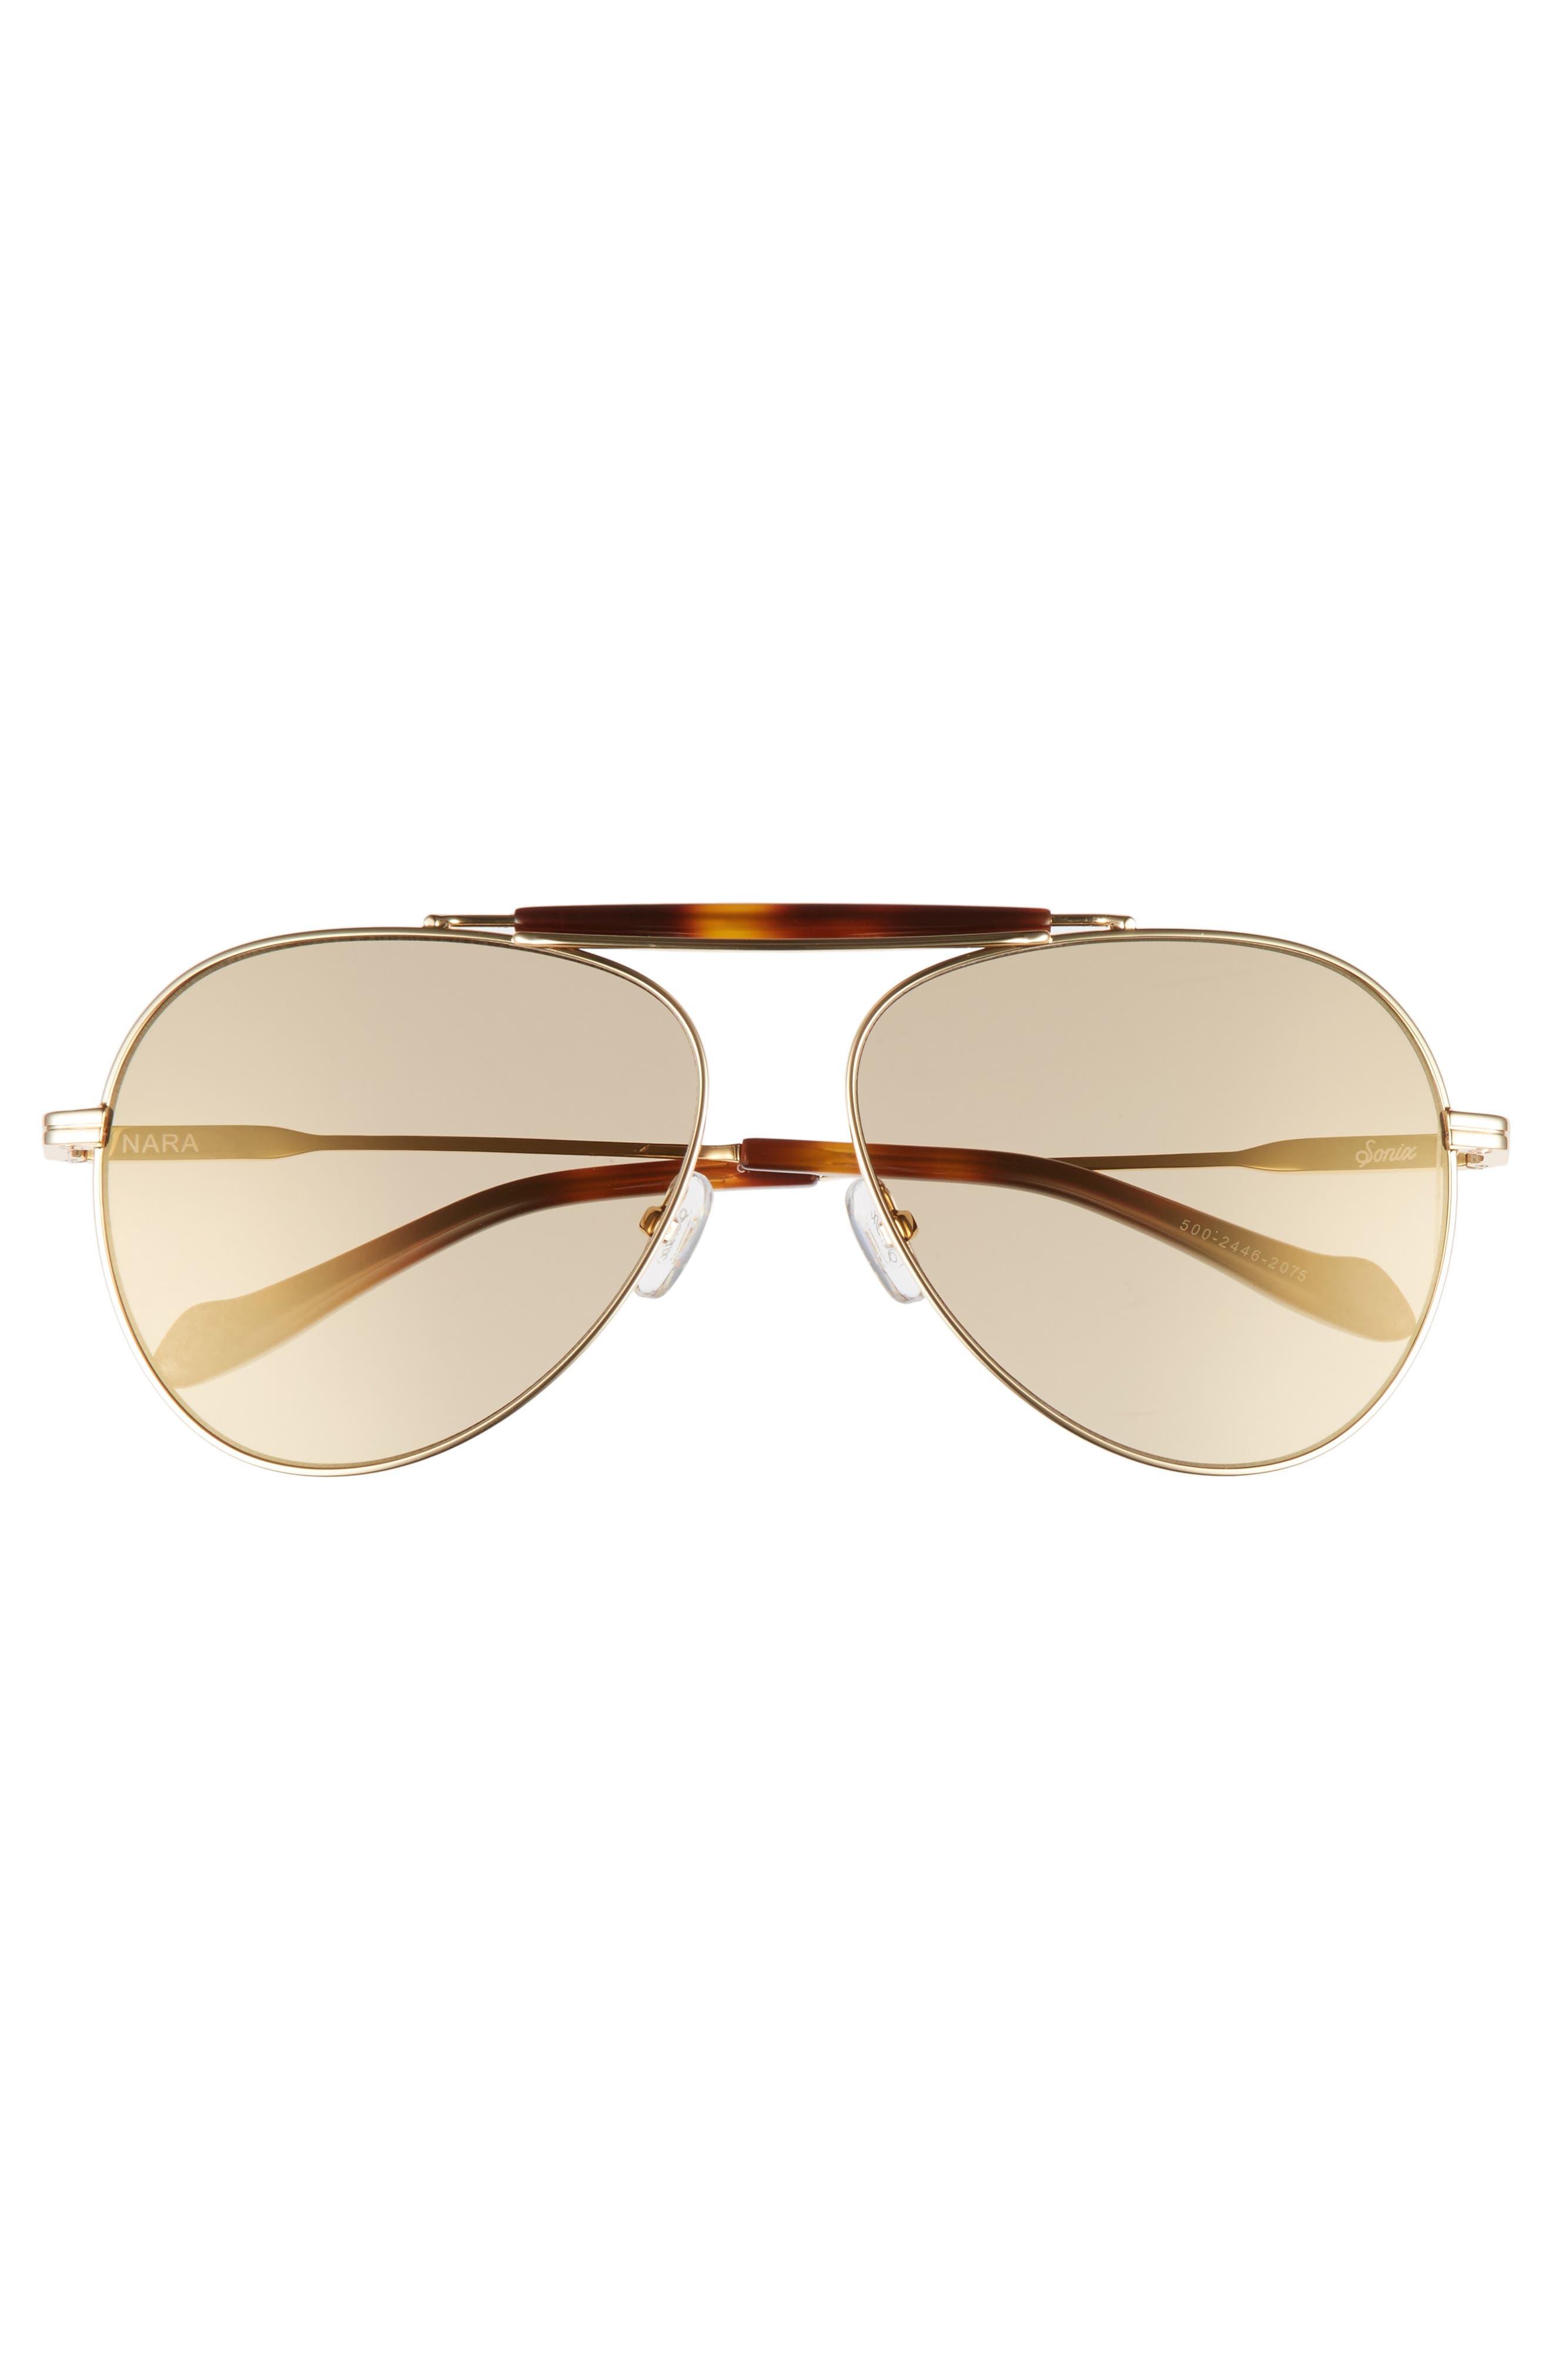 Nara 60mm Aviator Sunglasses,                             Alternate thumbnail 6, color,